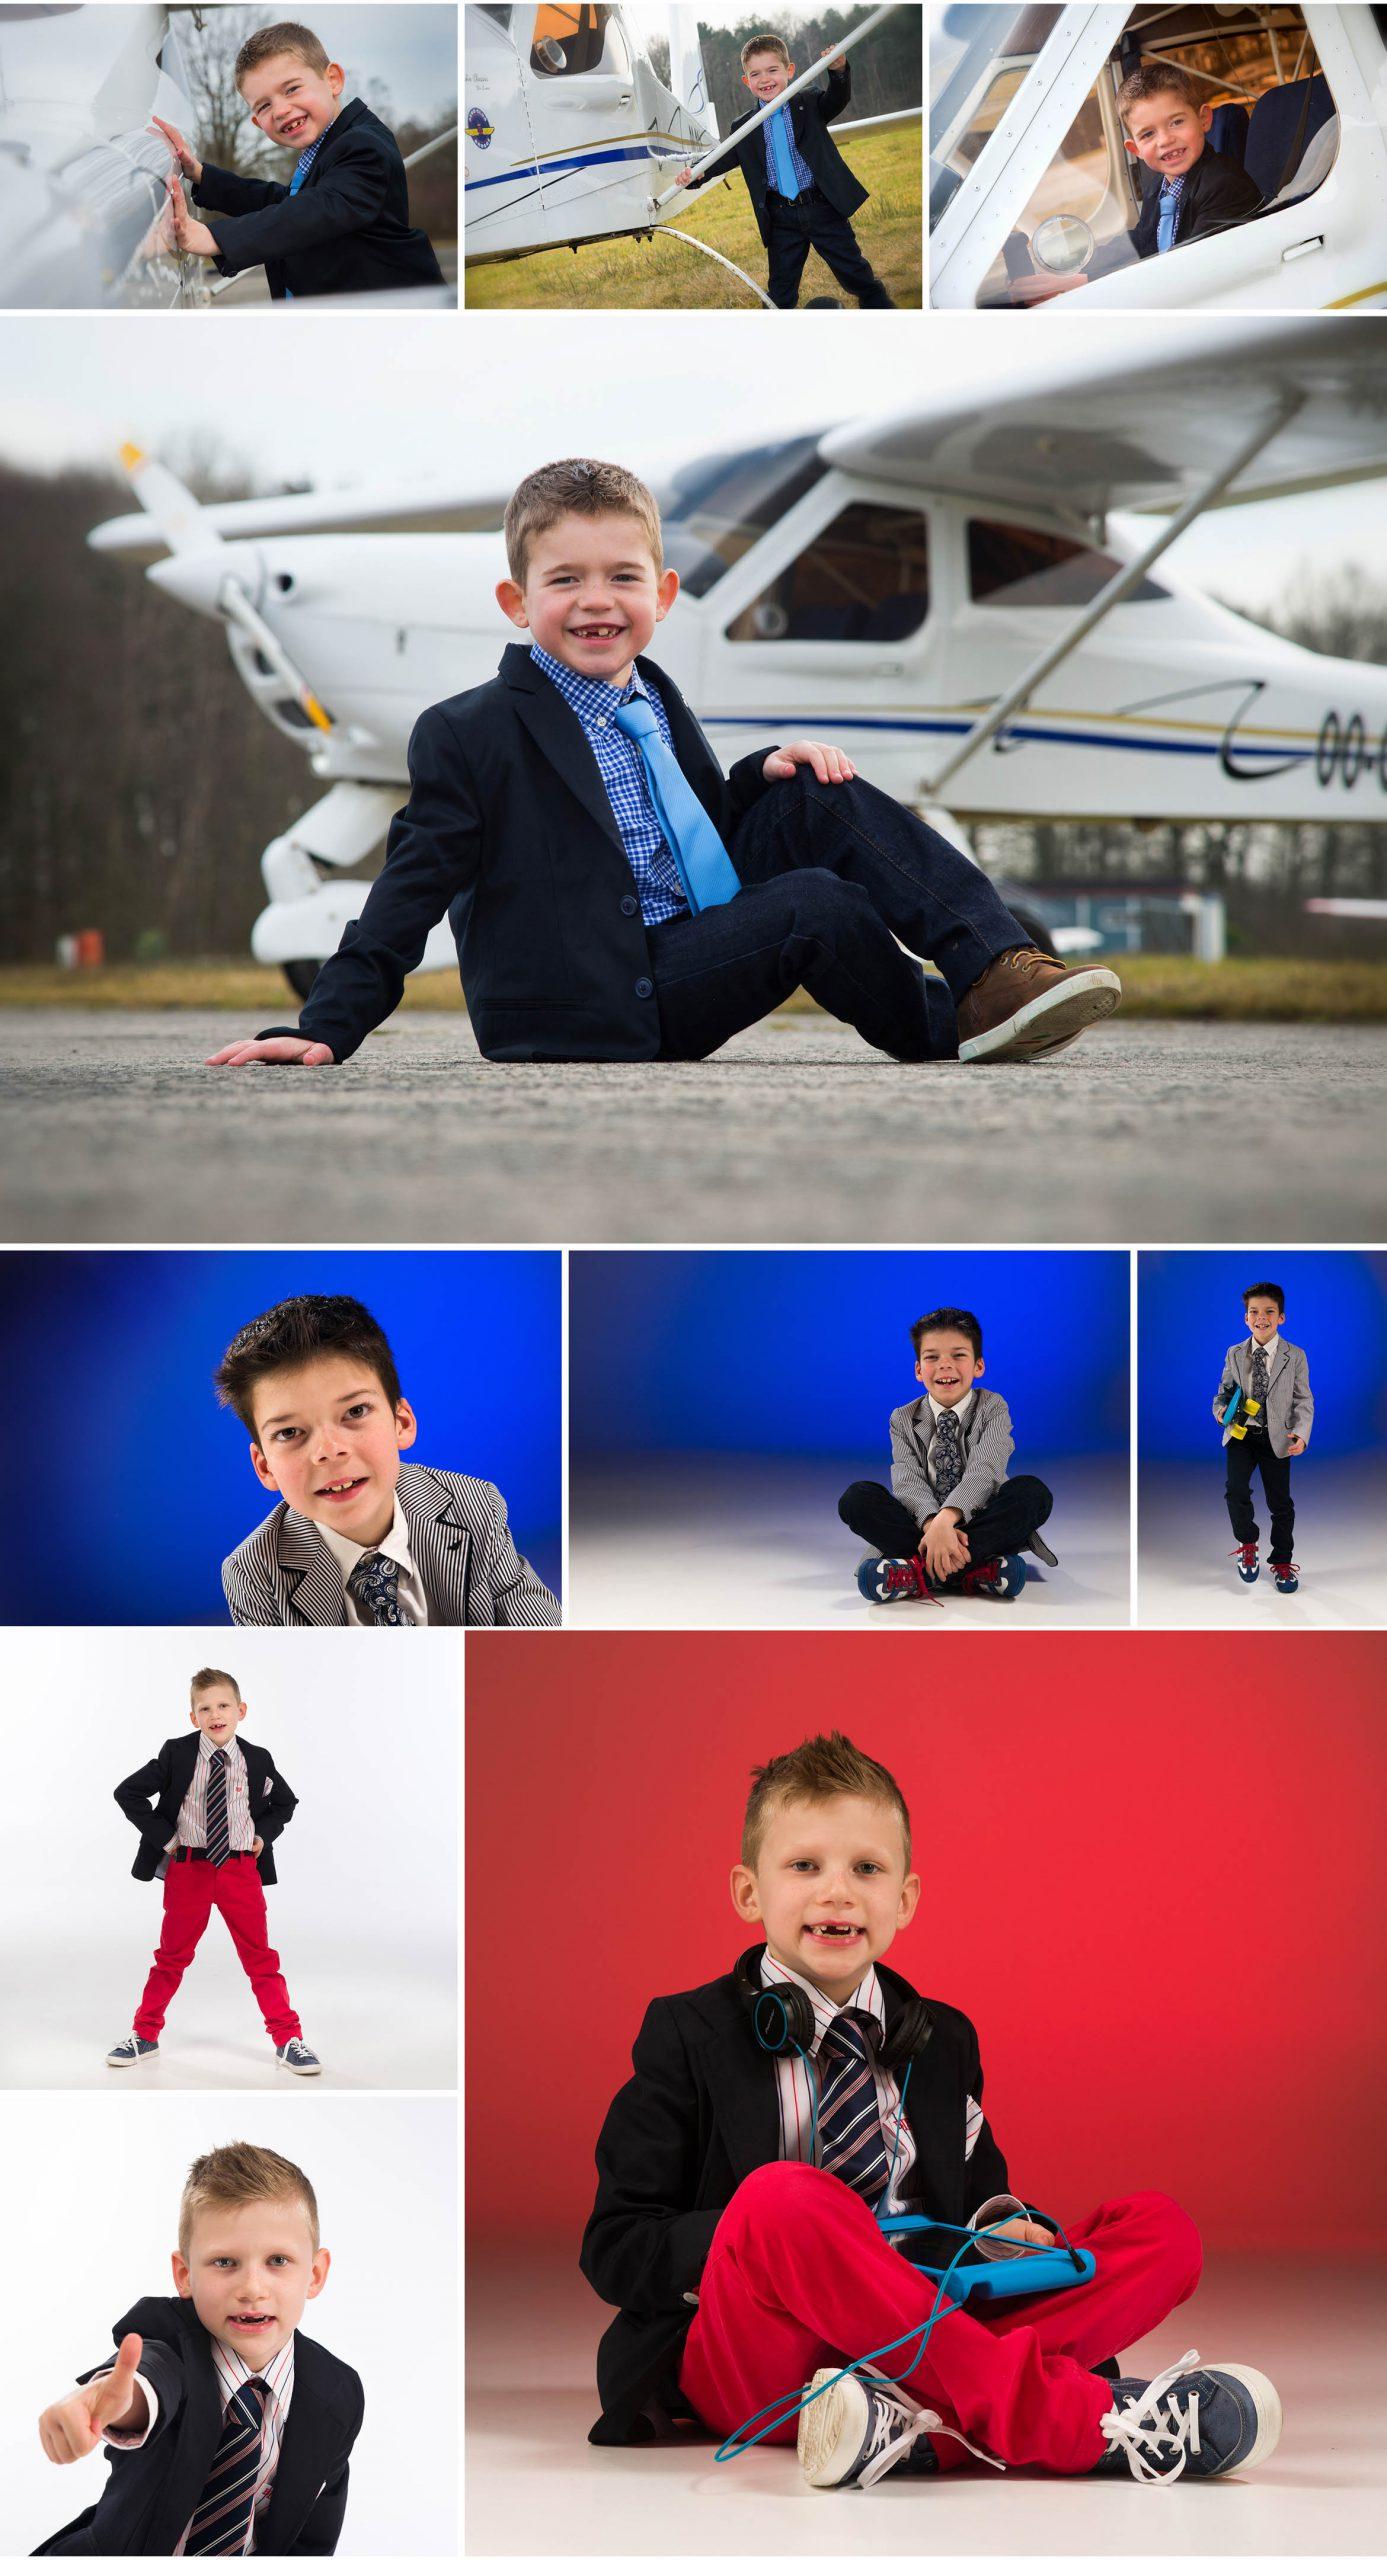 communie met vliegtuig